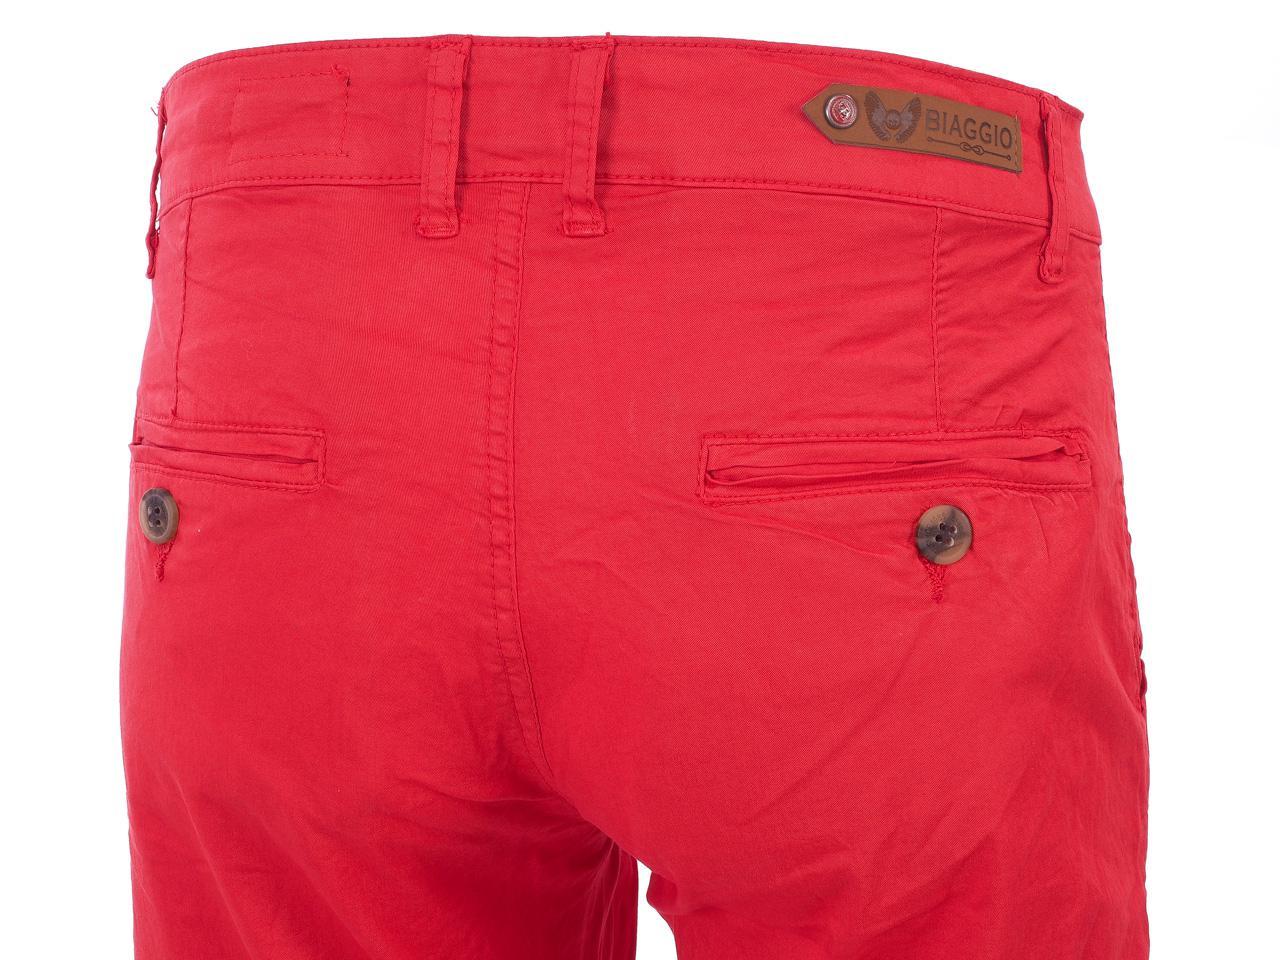 Hose-Biaggio-Tarel-Rot-Hose-Chino-Rot-22256-Neu Indexbild 3